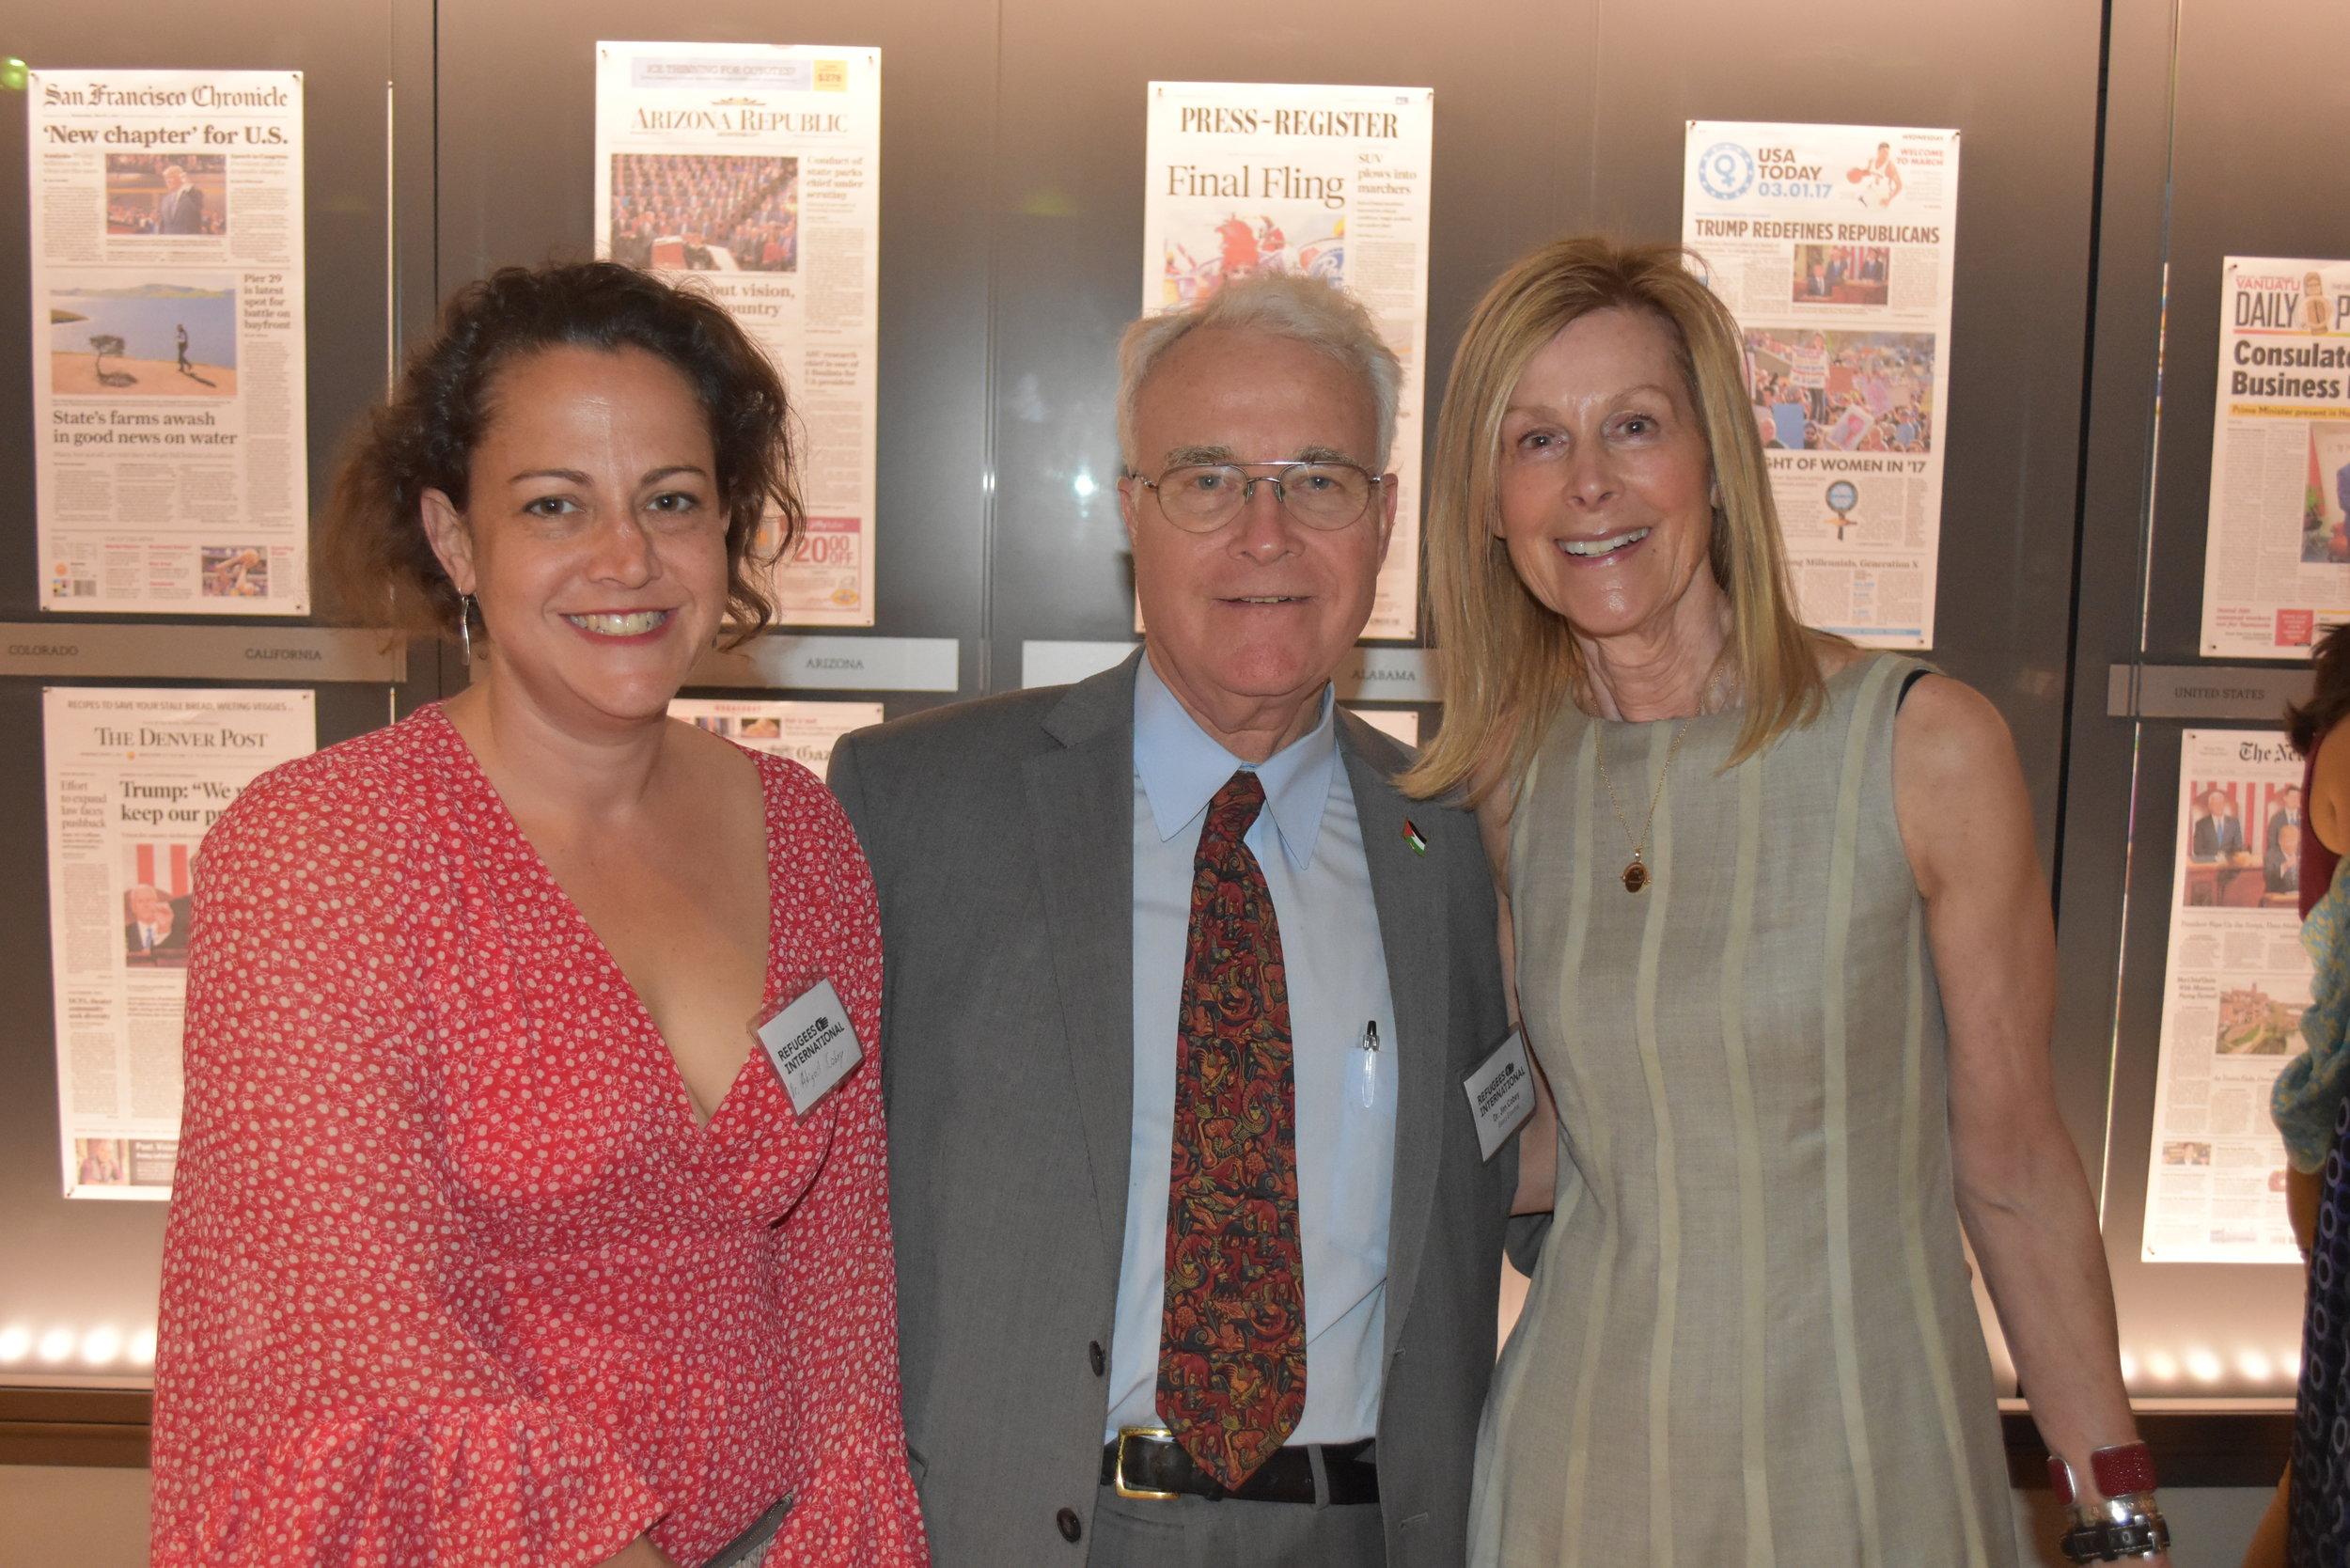 Dr. Abigail Cobey, RI Board Emeritus Dr. James Cobey, and RI Board Chair Eileen Shields-West